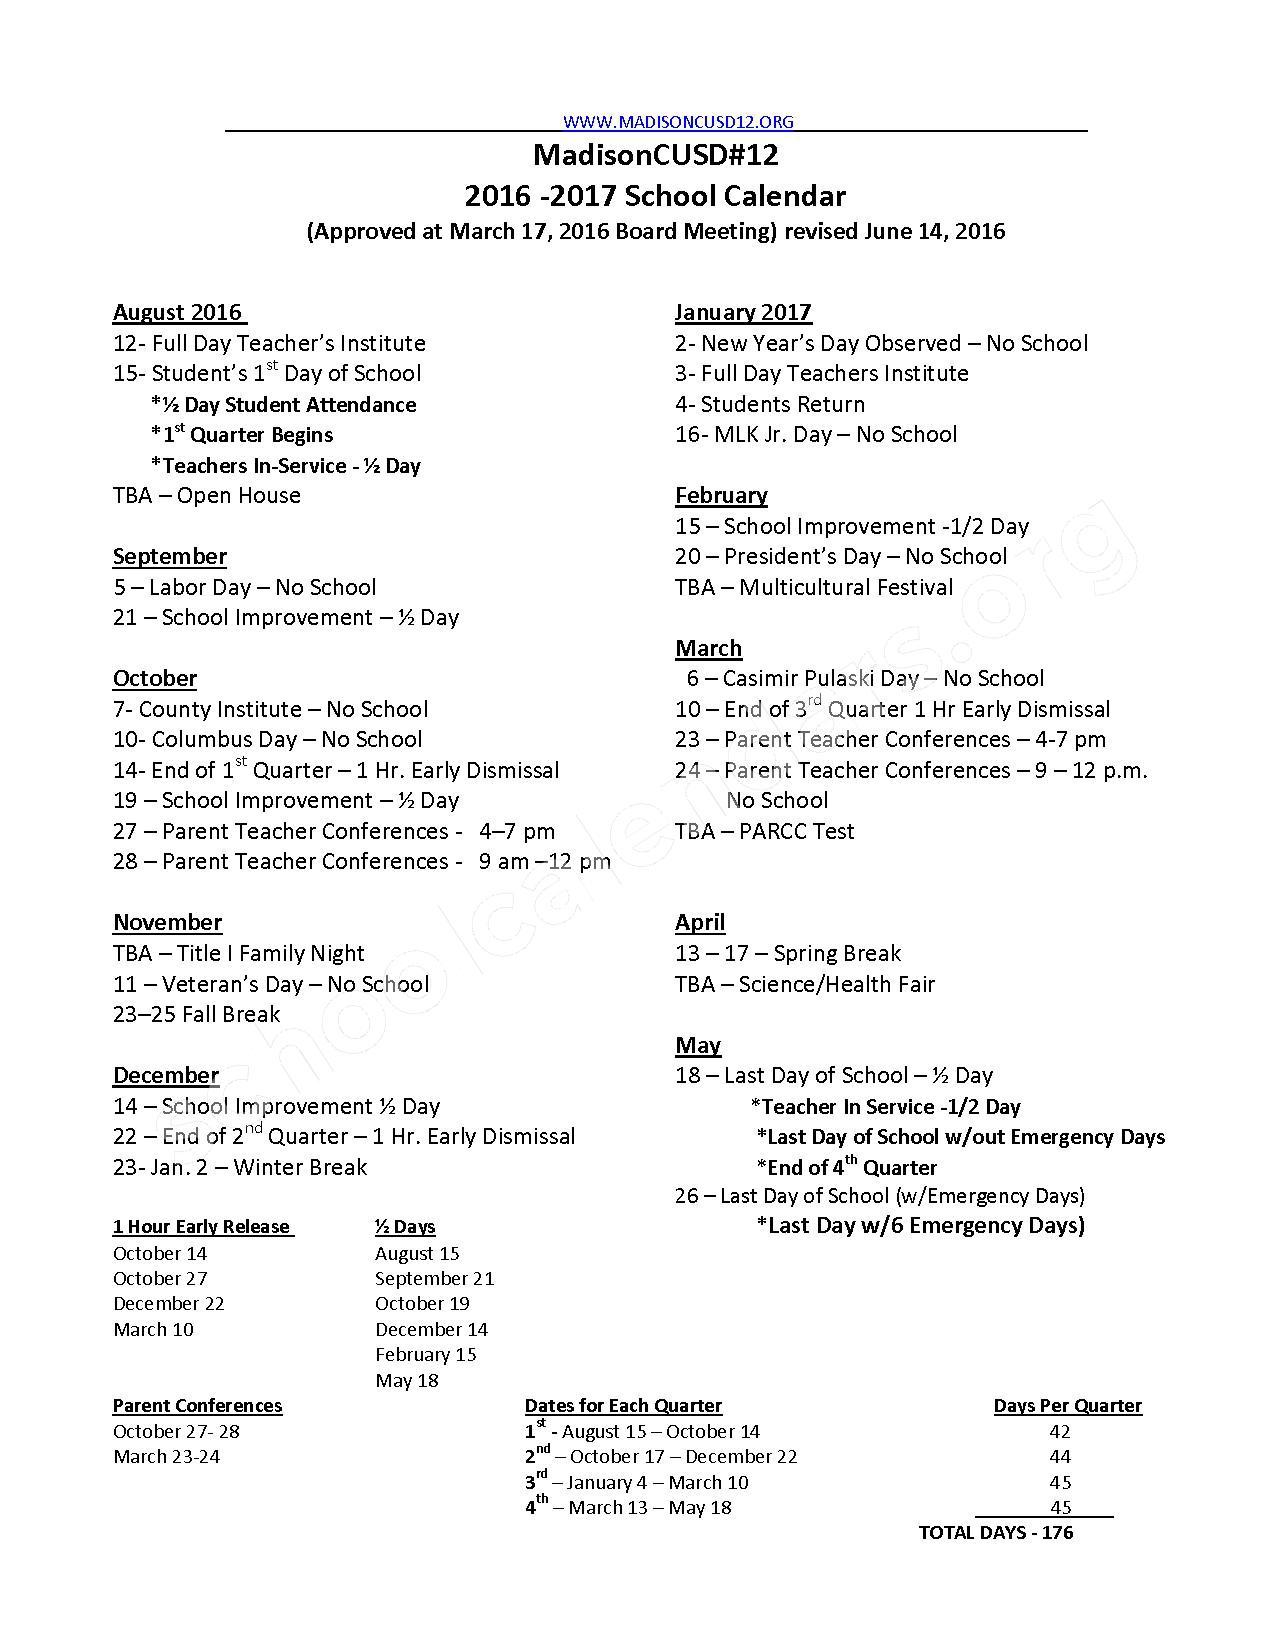 2016 - 2017 School Calendar – Madison Community Unit School District 12 – page 1